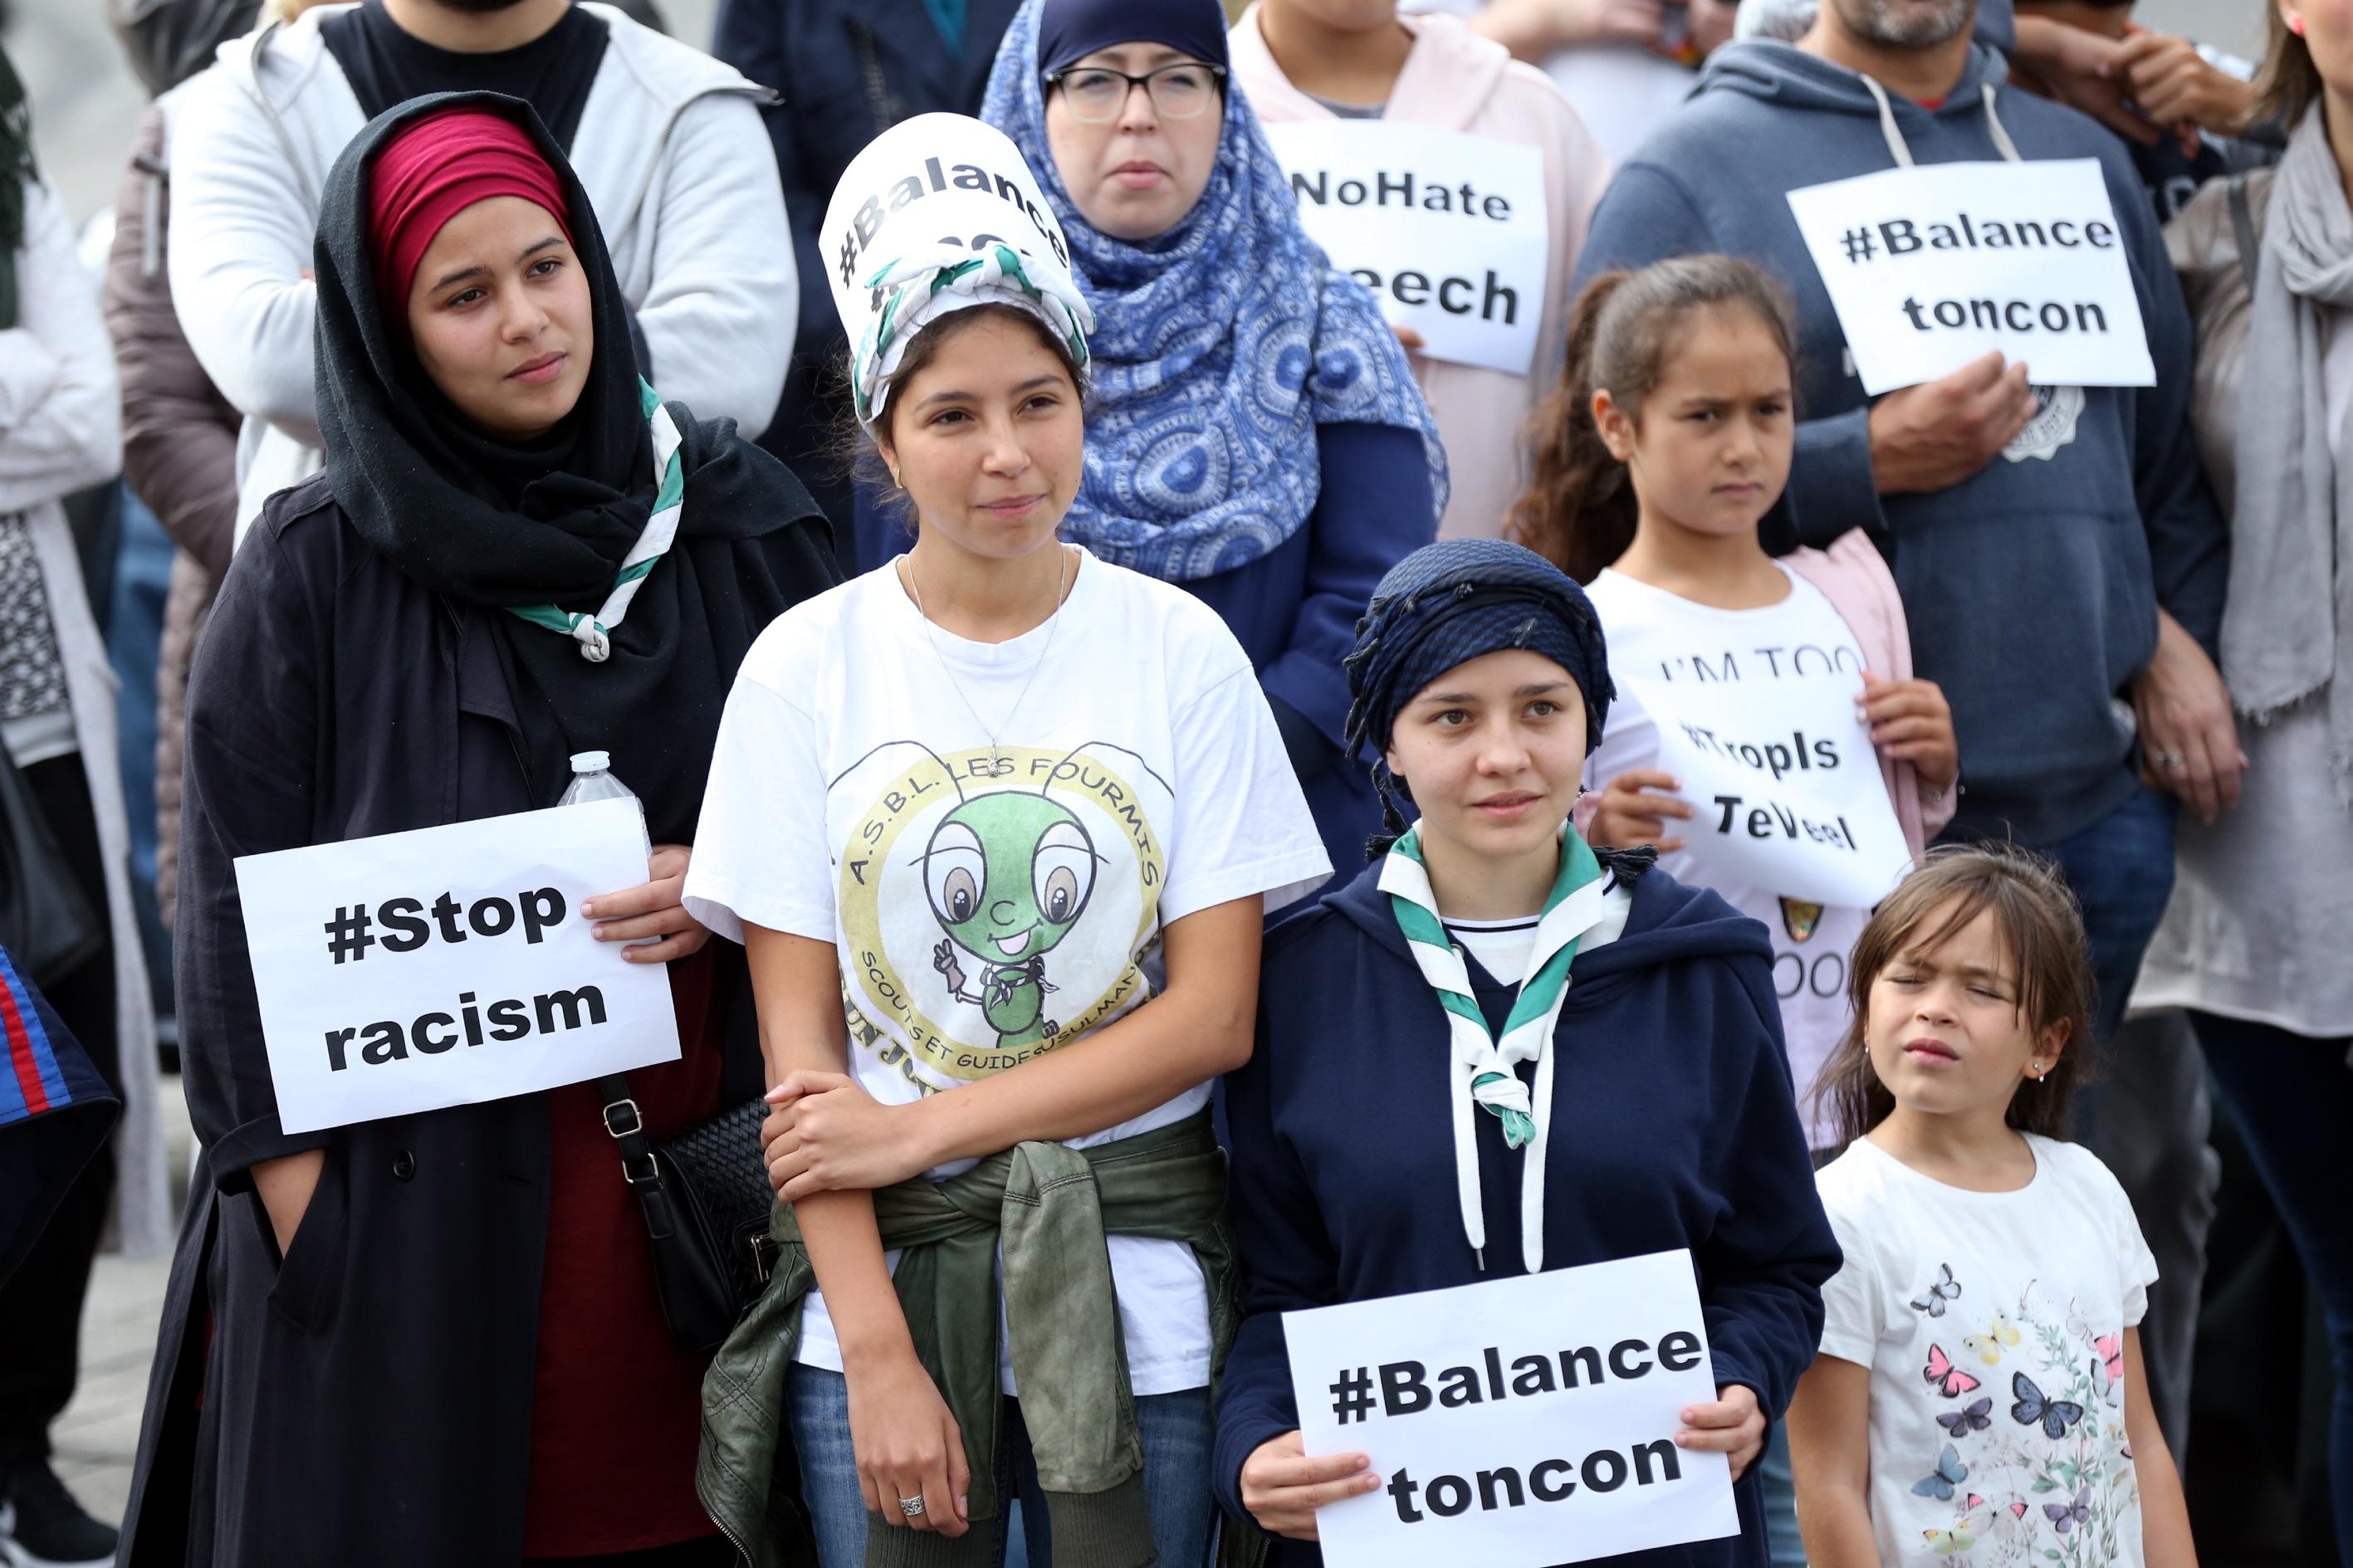 Belgium: 76 pct of Islamophobic attacks target women in